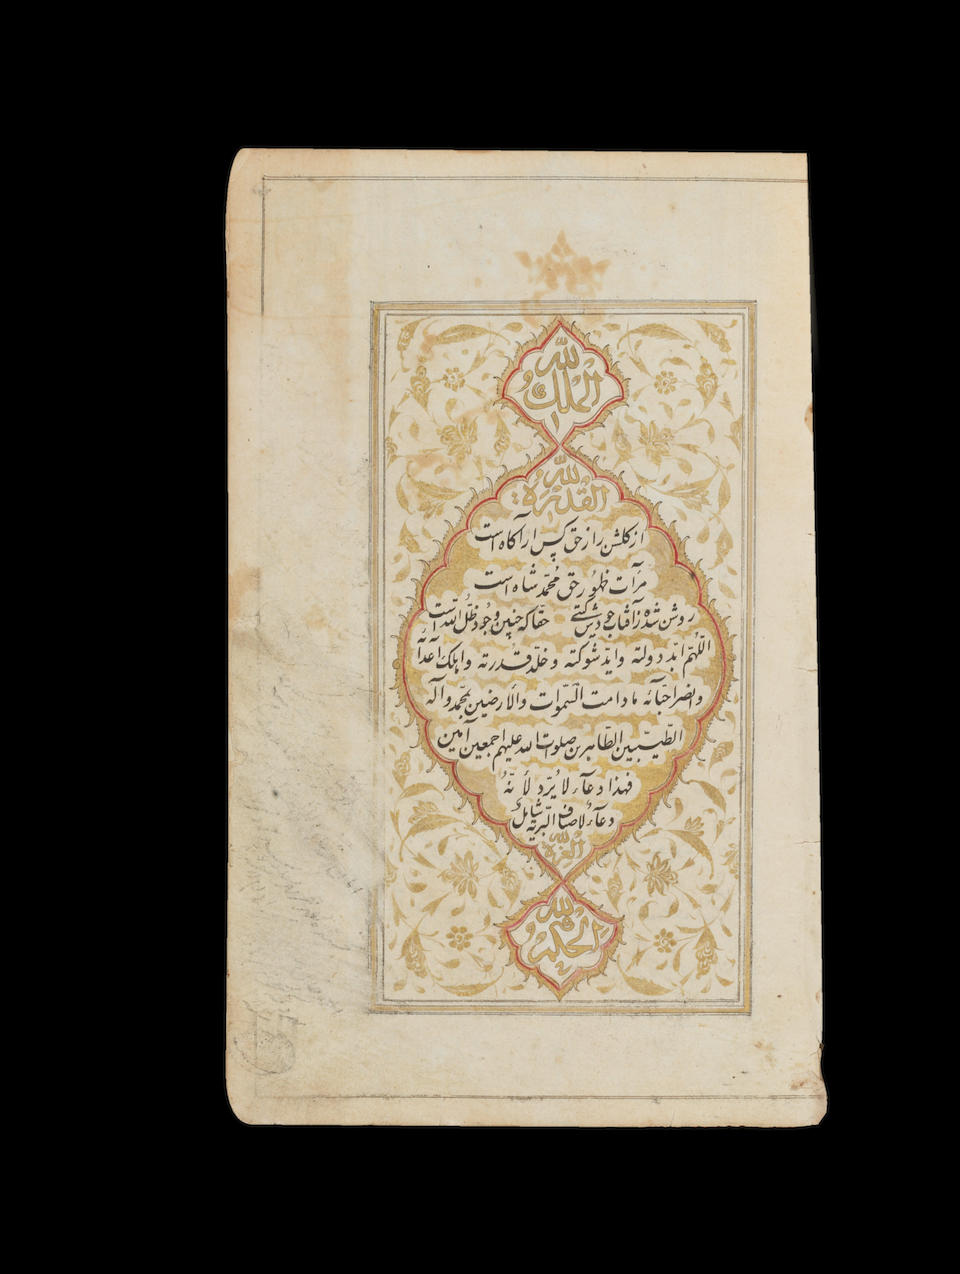 Mahmud Shabastari (d. 1339), Gulshan-e raz, Sufi poetry, with a dedication to Muhammad Shah Qajar (reg. 1834-48) Persia, circa 1840